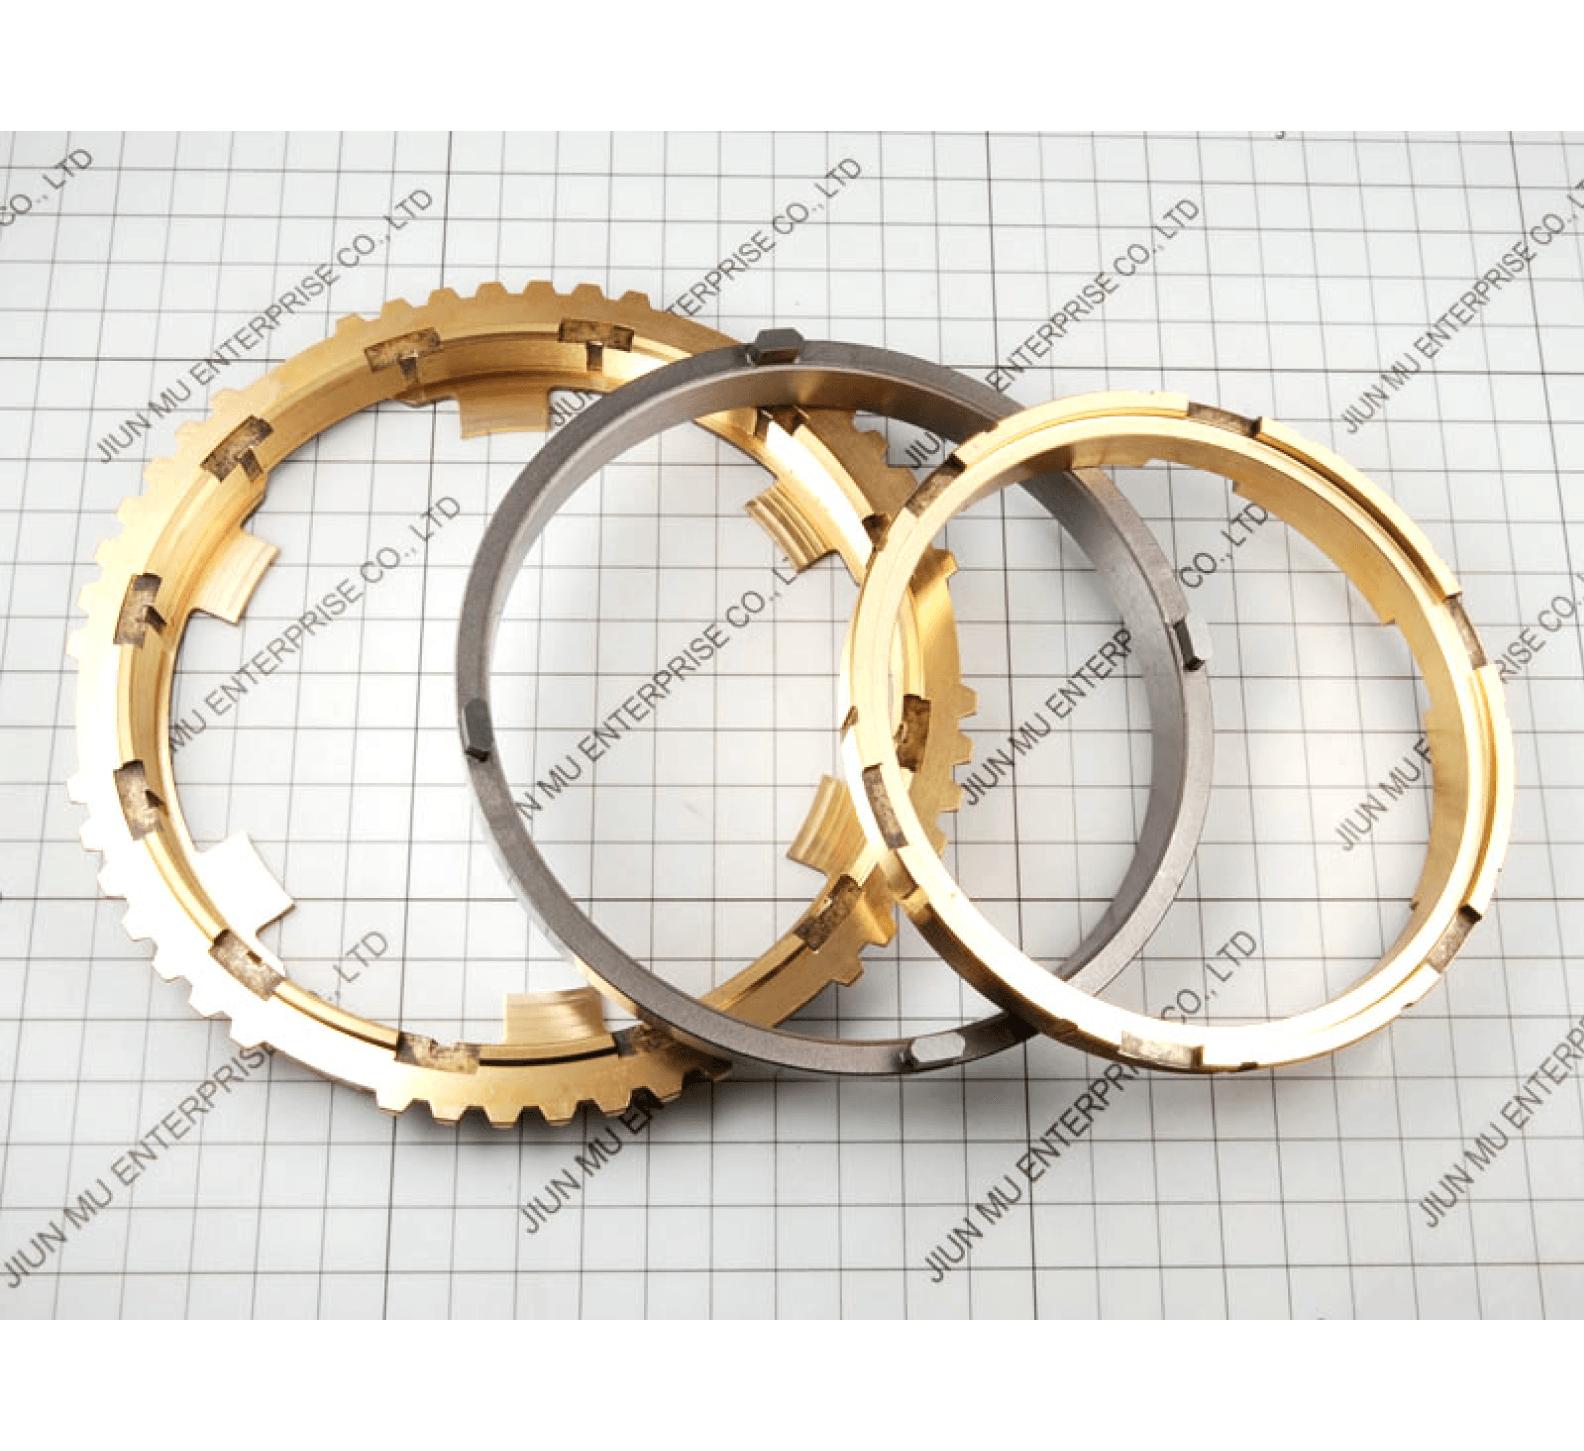 Bus Synchronizer Ring for Transmission Systems made by JIUN MU ENTERPRISE CO., LTD. 均牧實業股份有限公司 - MatchSupplier.com